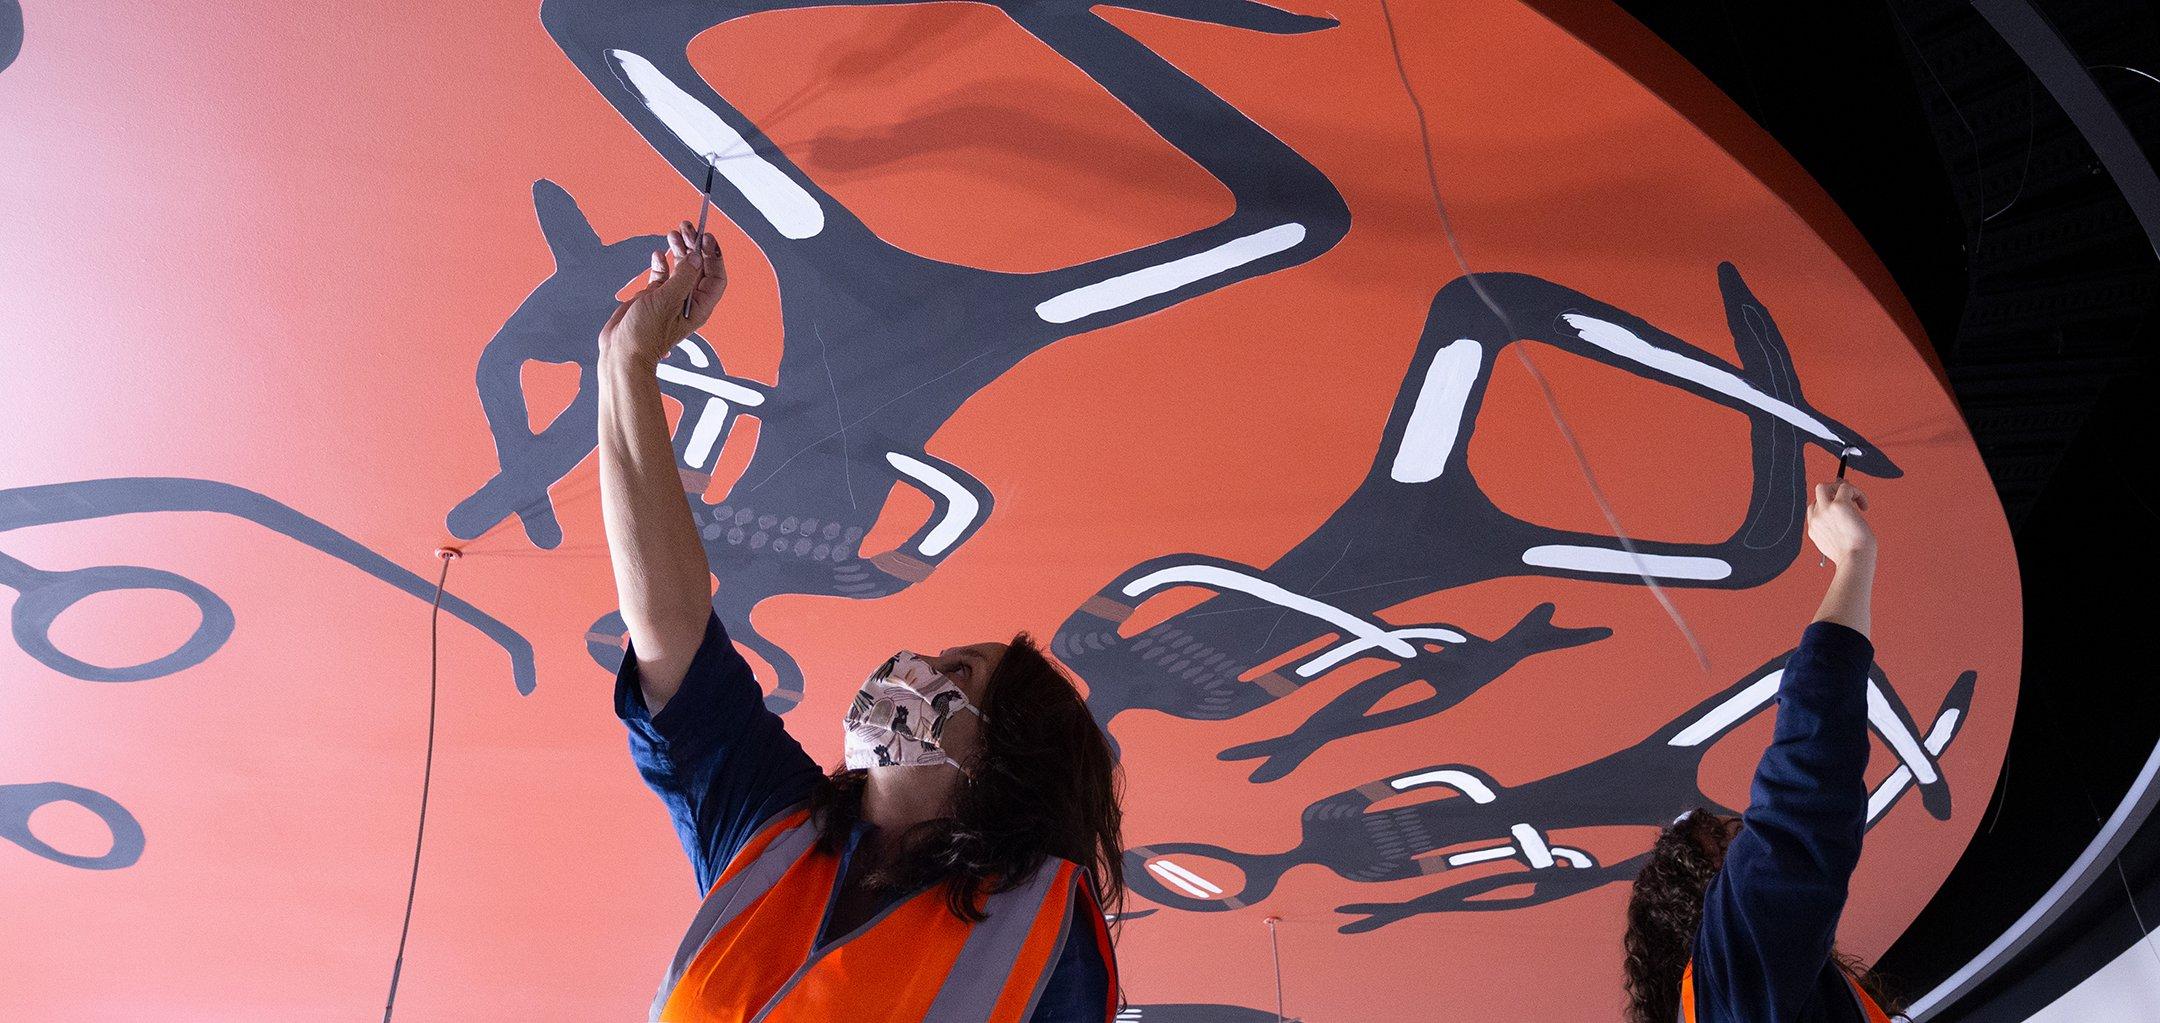 Installing Yanmeearr by Vicki Couzens - Field Carr